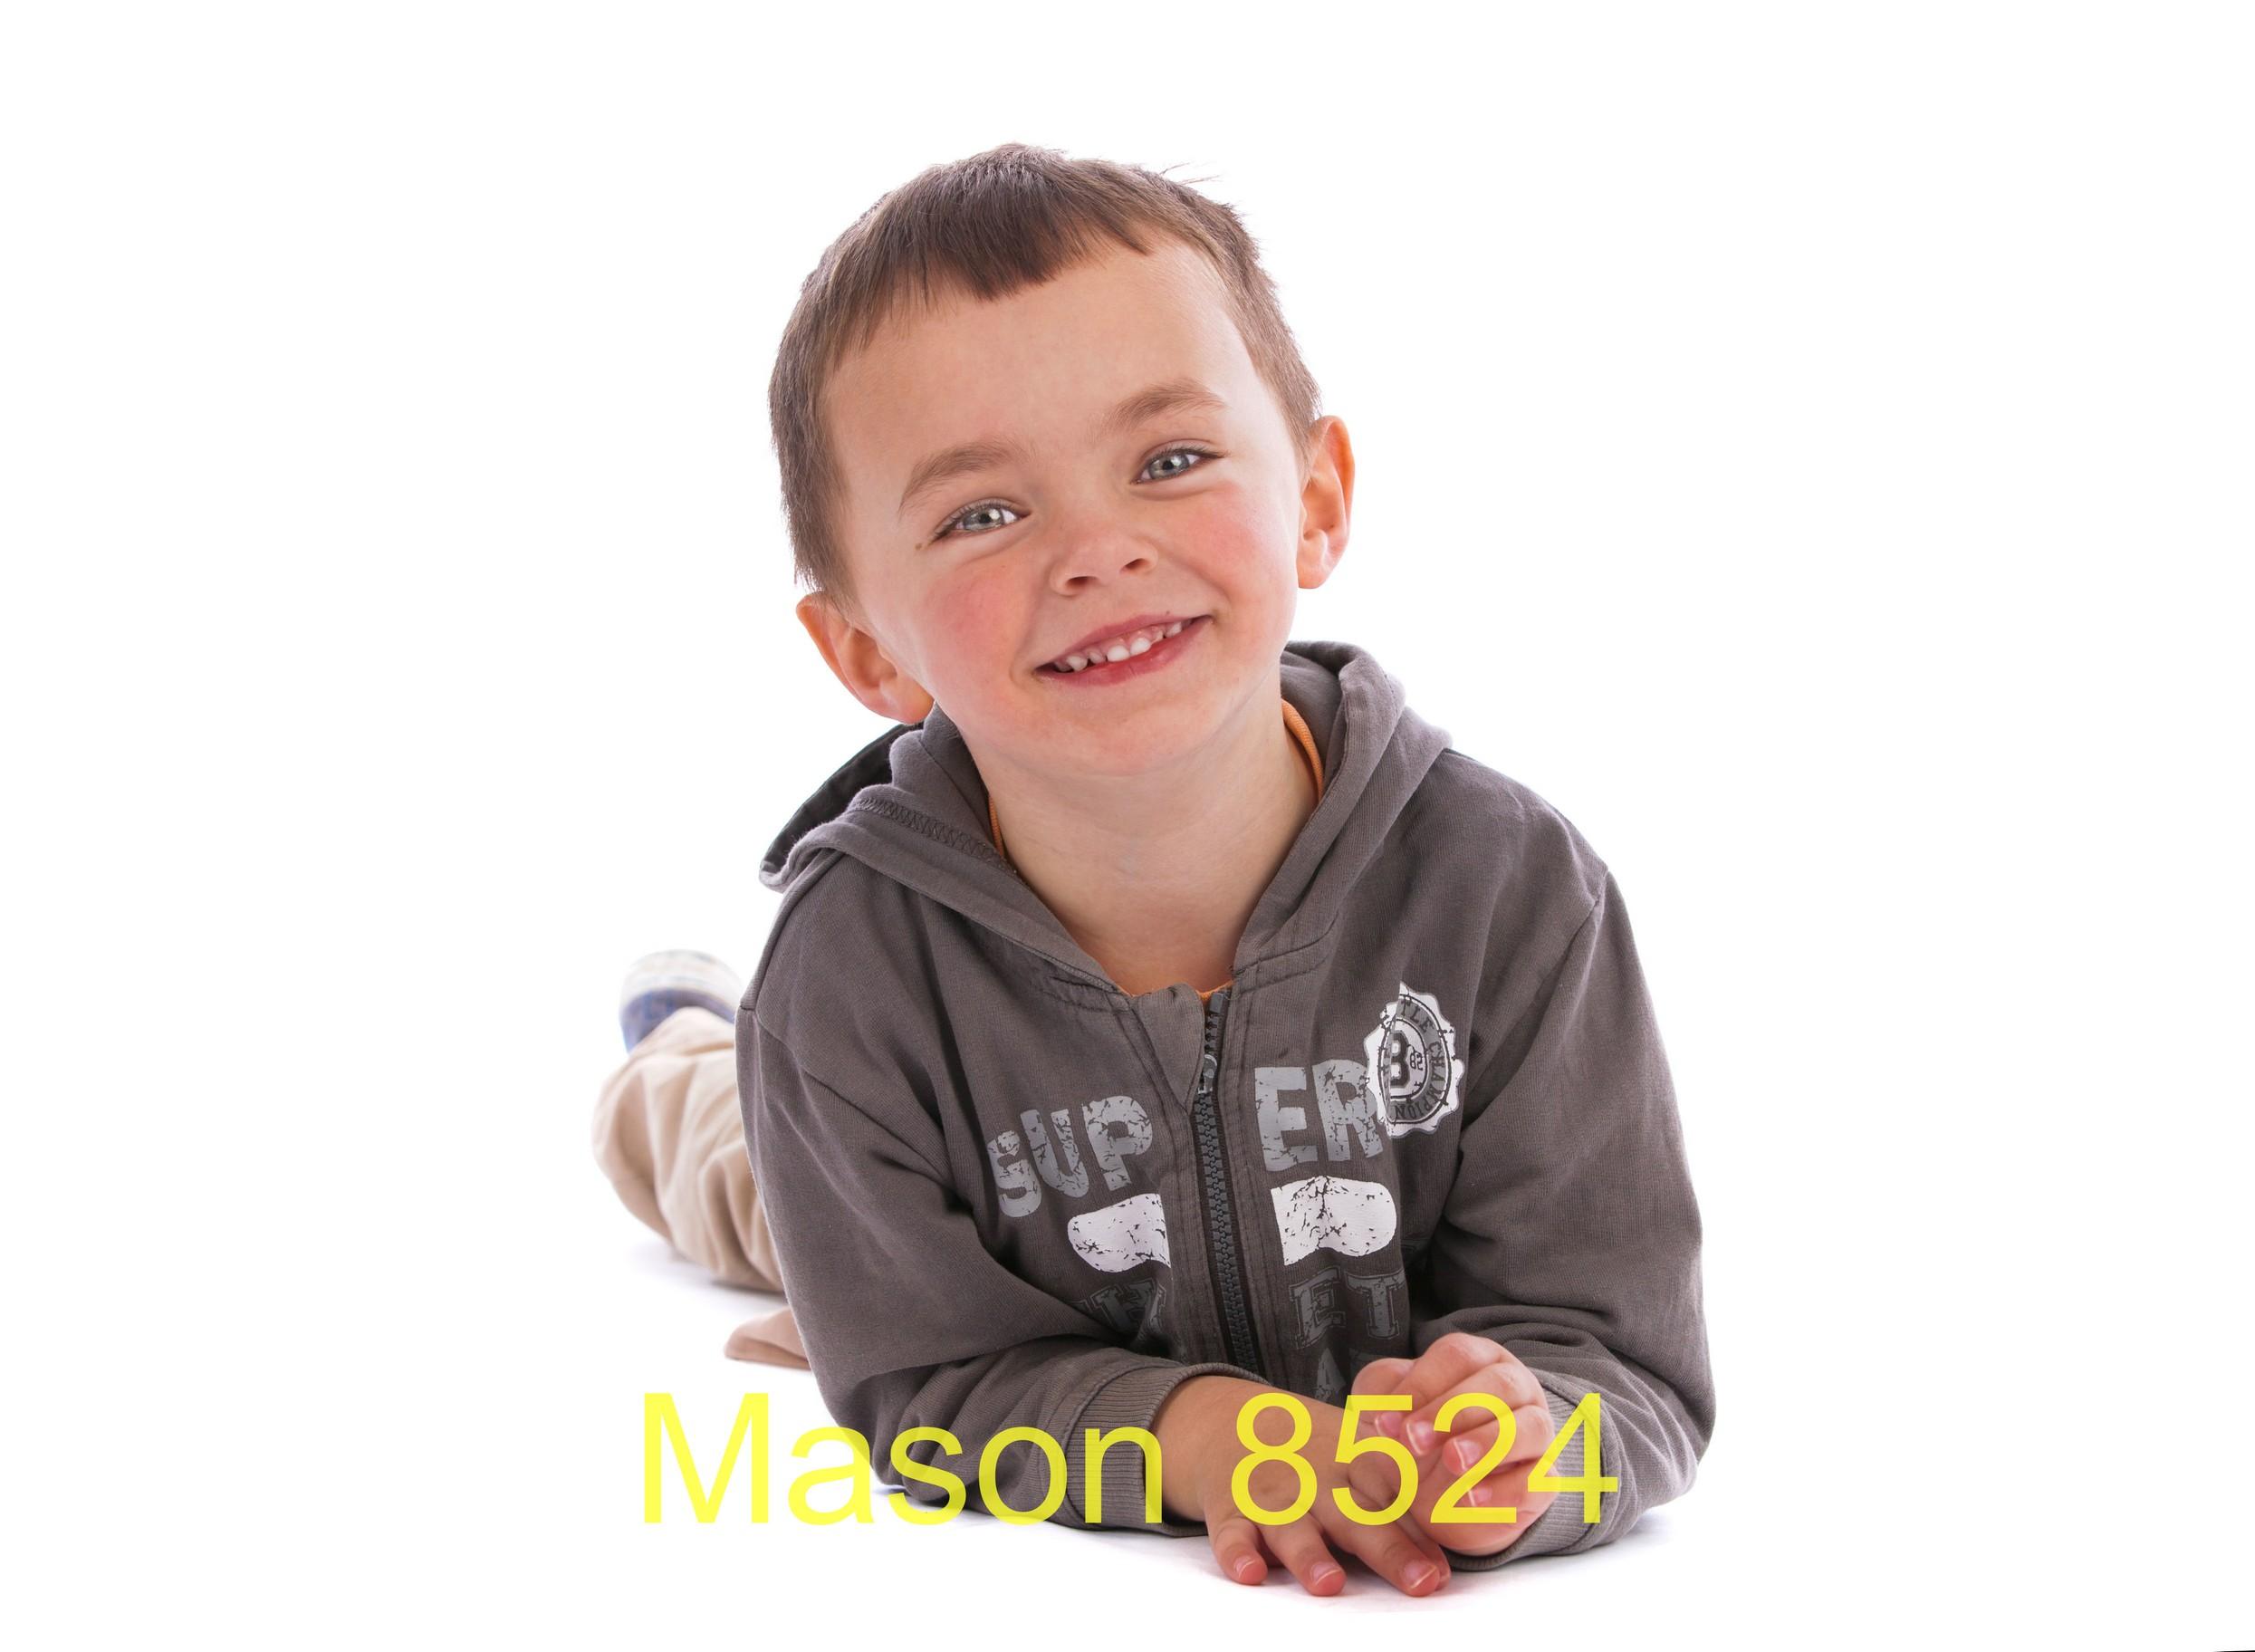 Mason 8524